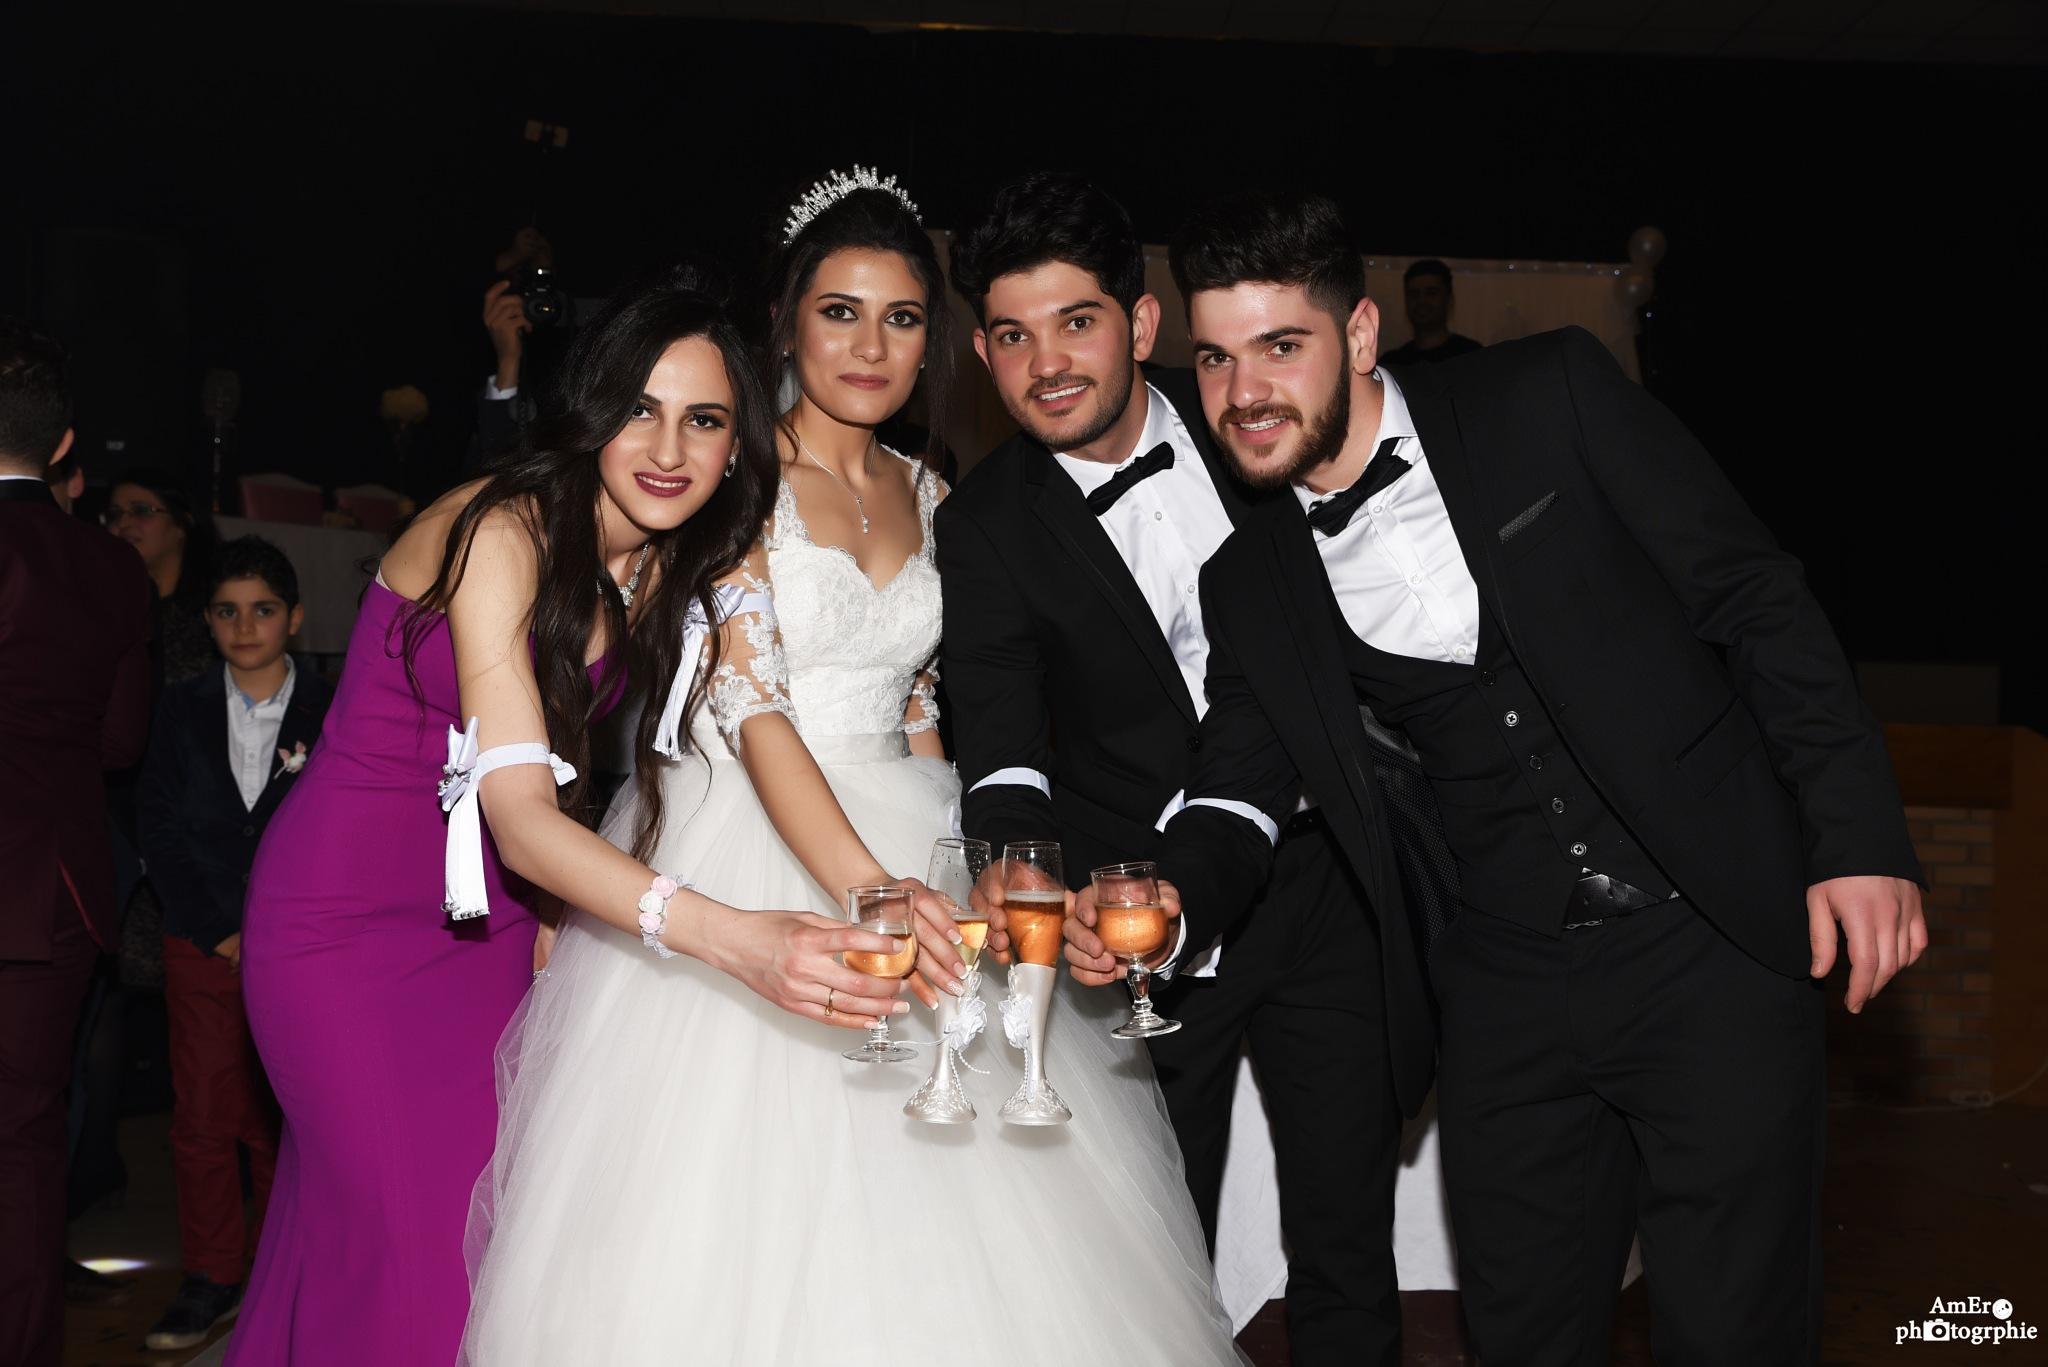 wedding by Amer BARSOUM